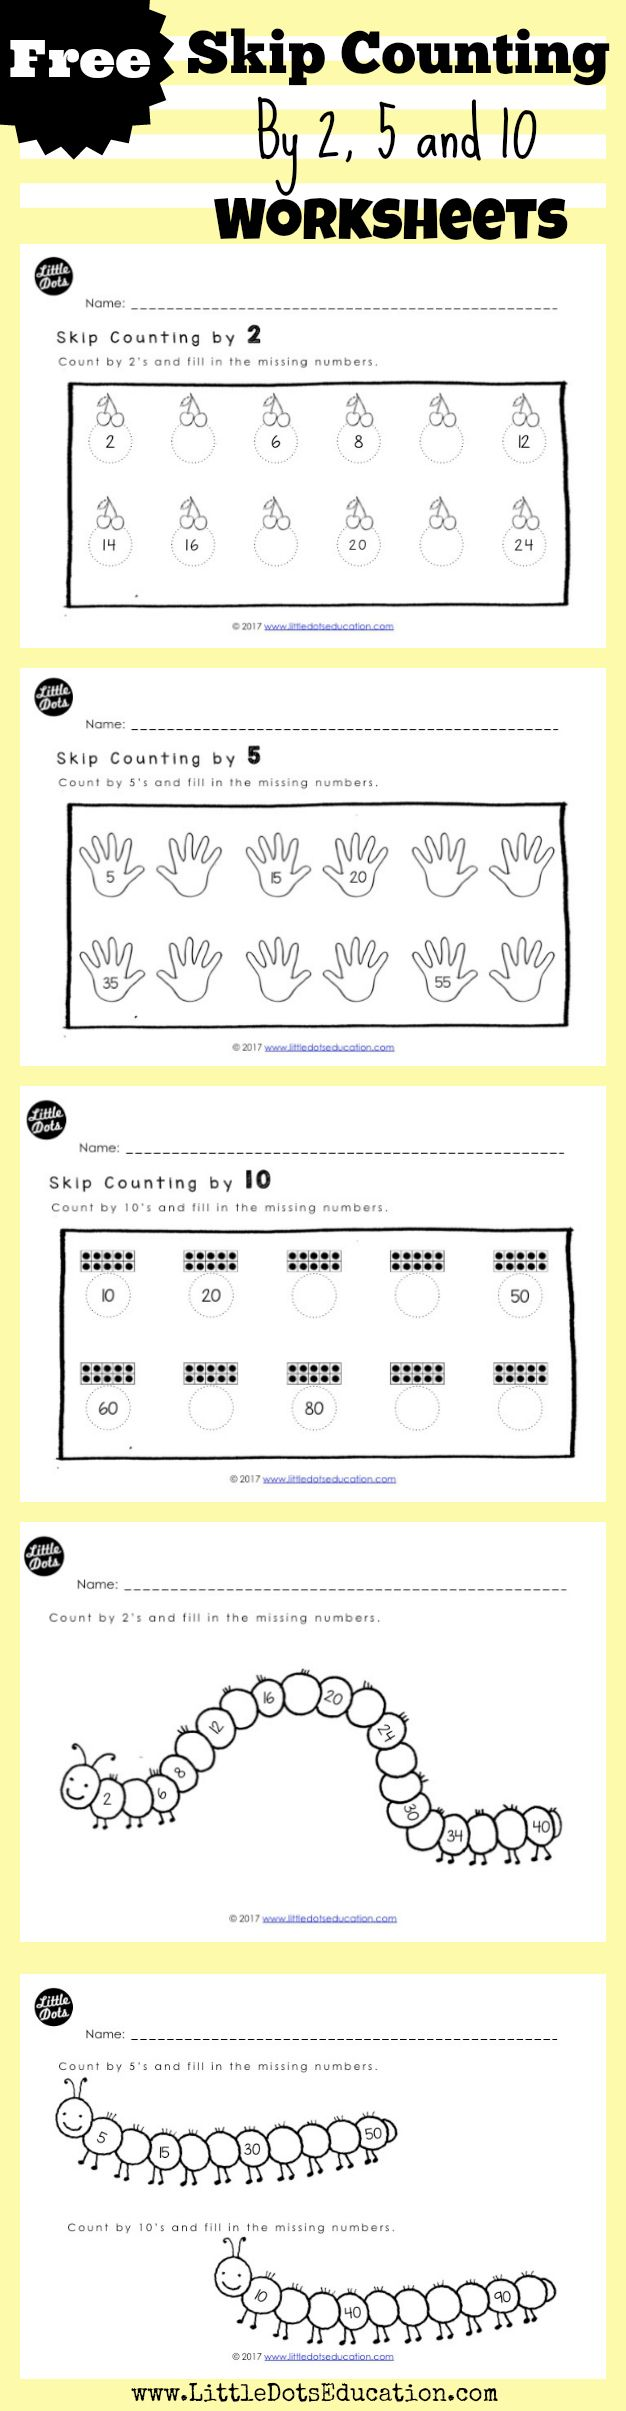 Skip counting worksheets kindergarten